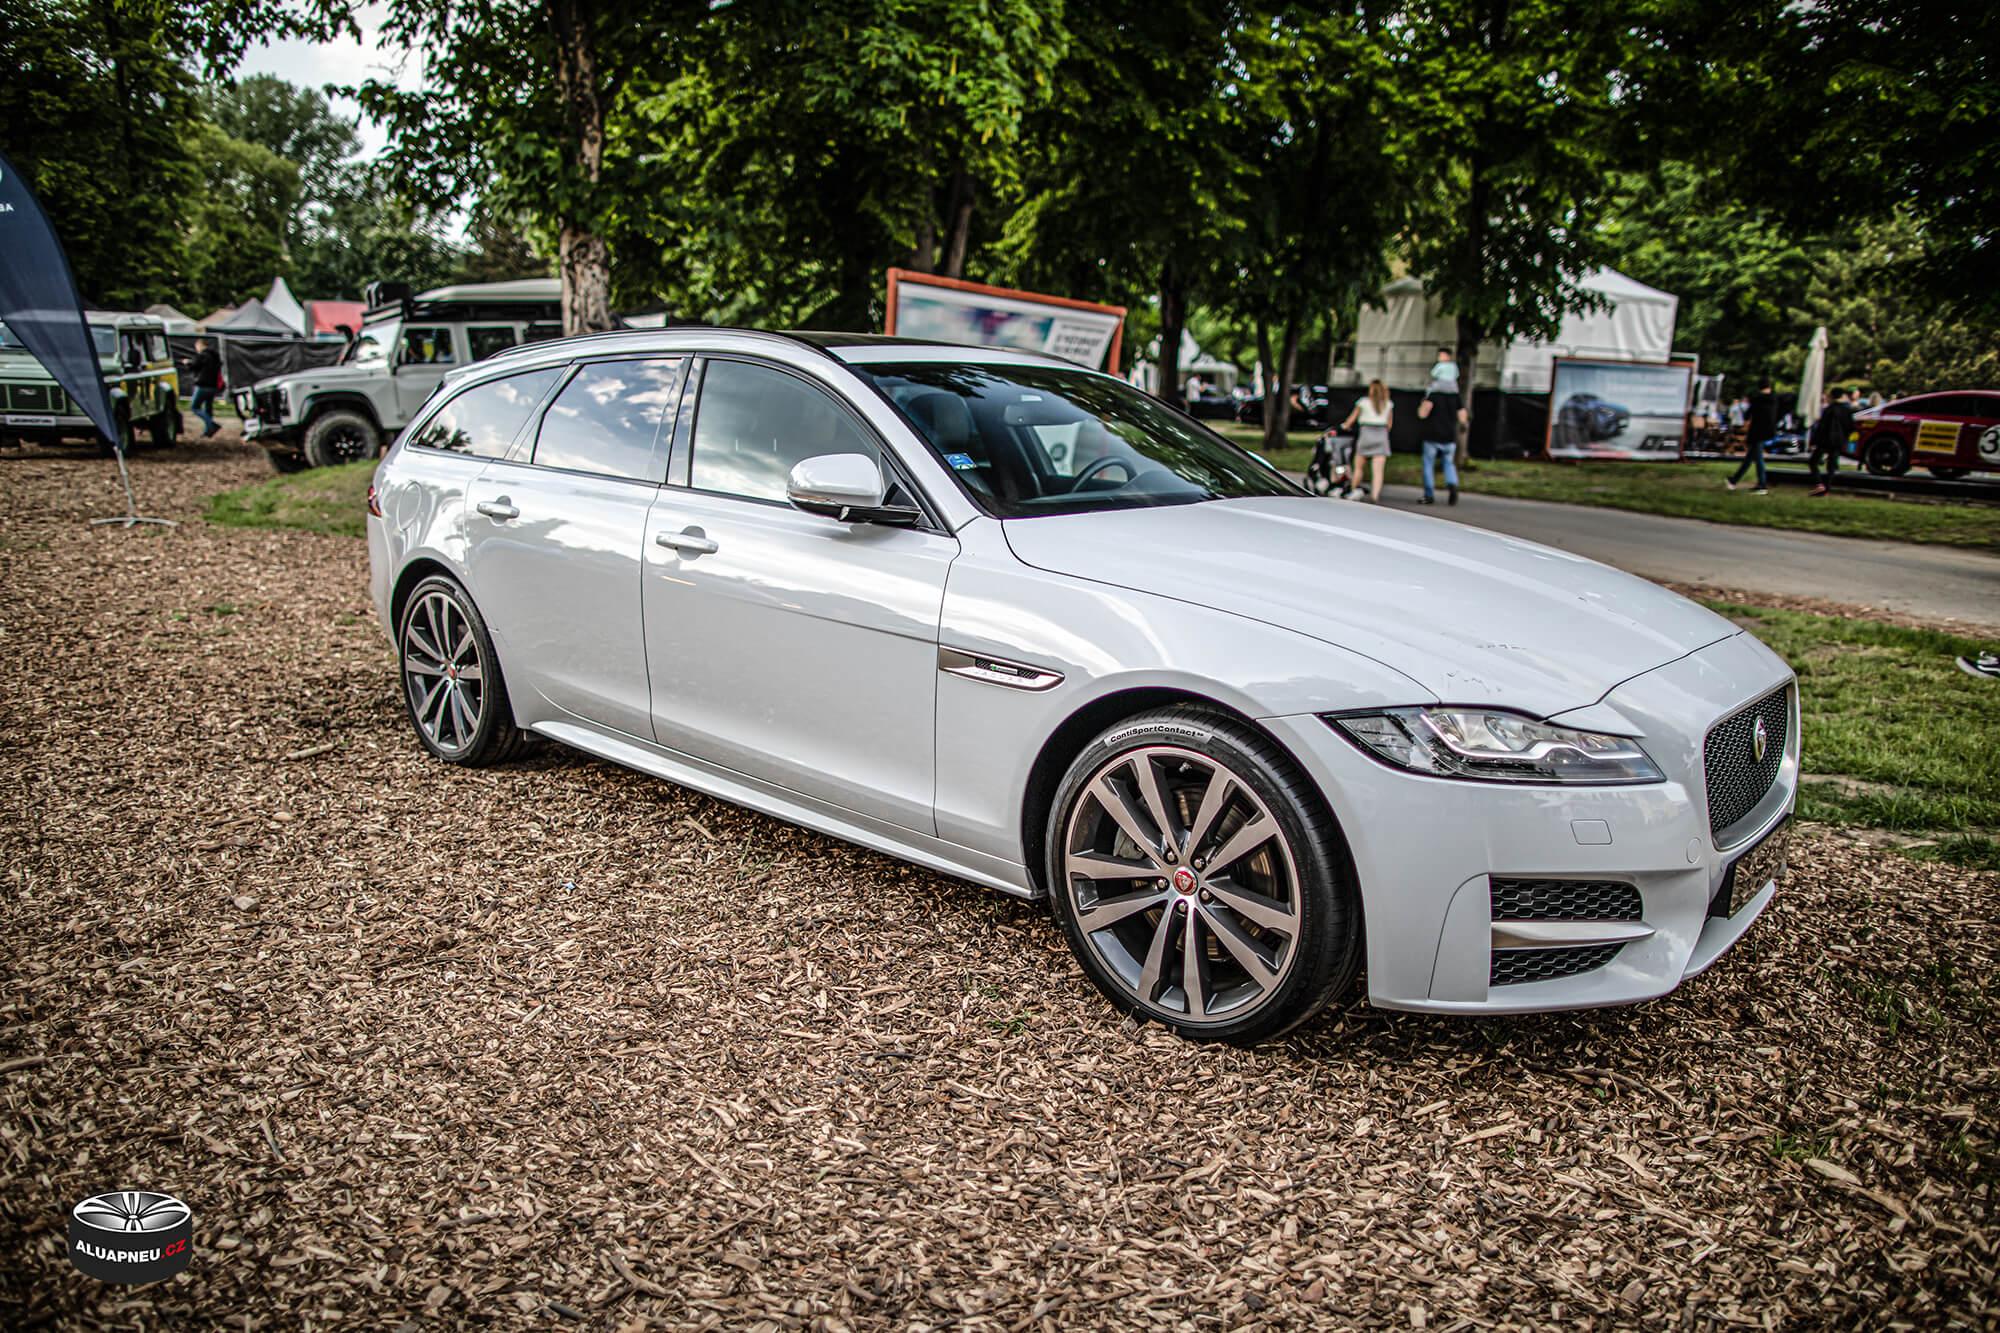 Originální alu kola Jaguar - Automobilové Legendy 2019 - www.aluapneu.cz